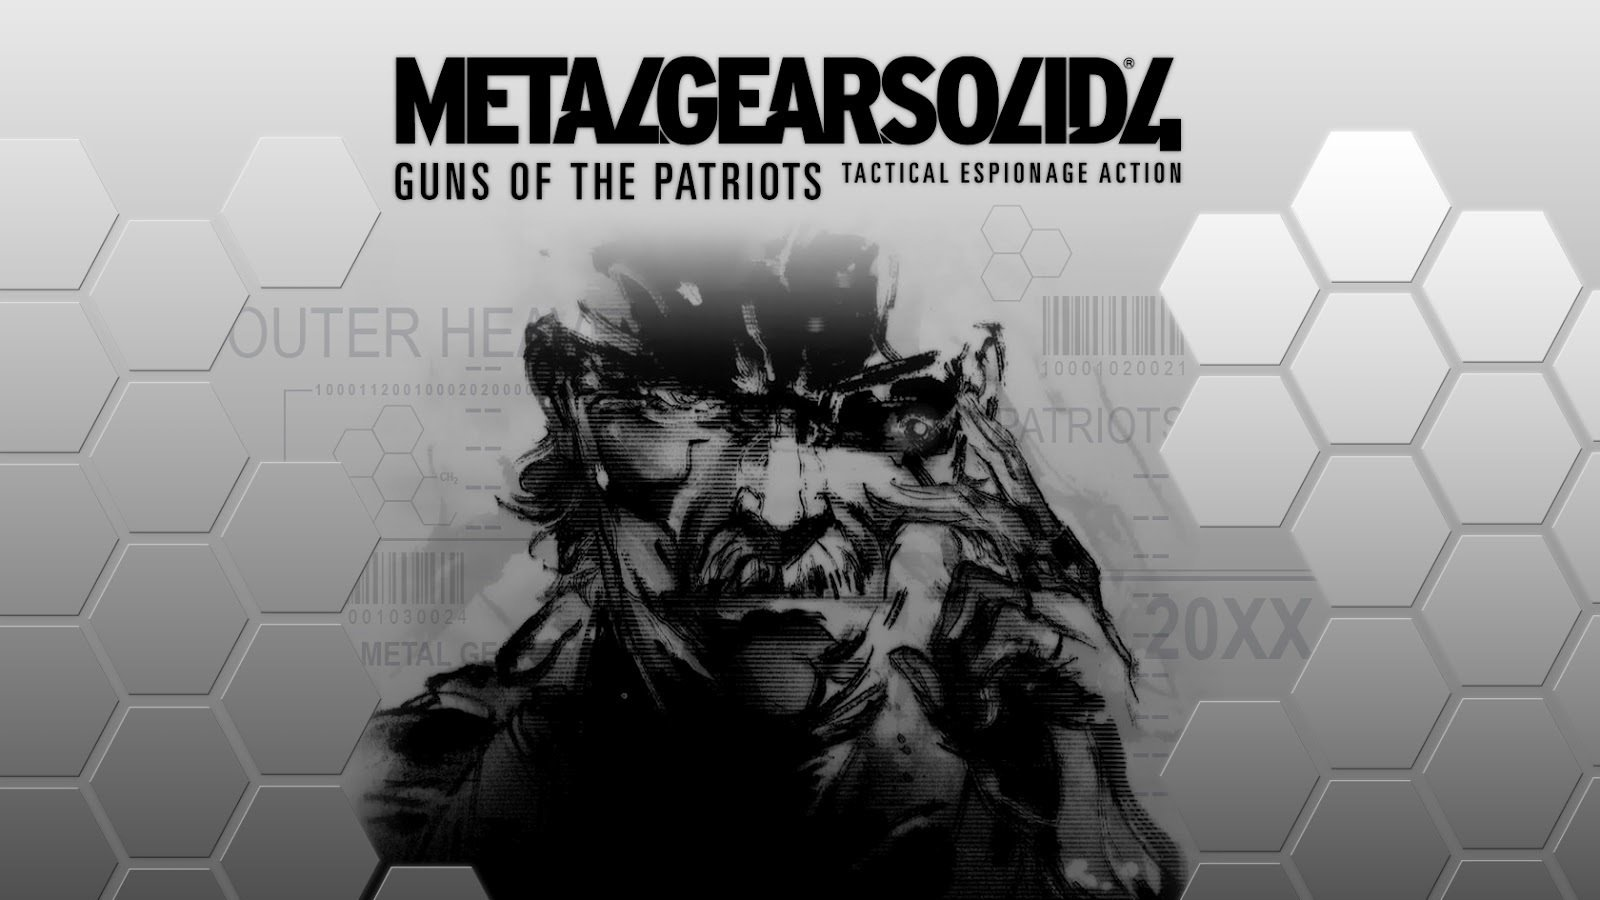 Metal Gear Solid 4 Wallpaper - Metal Gear Solid 4 Guns Of The Patriots Ost - HD Wallpaper